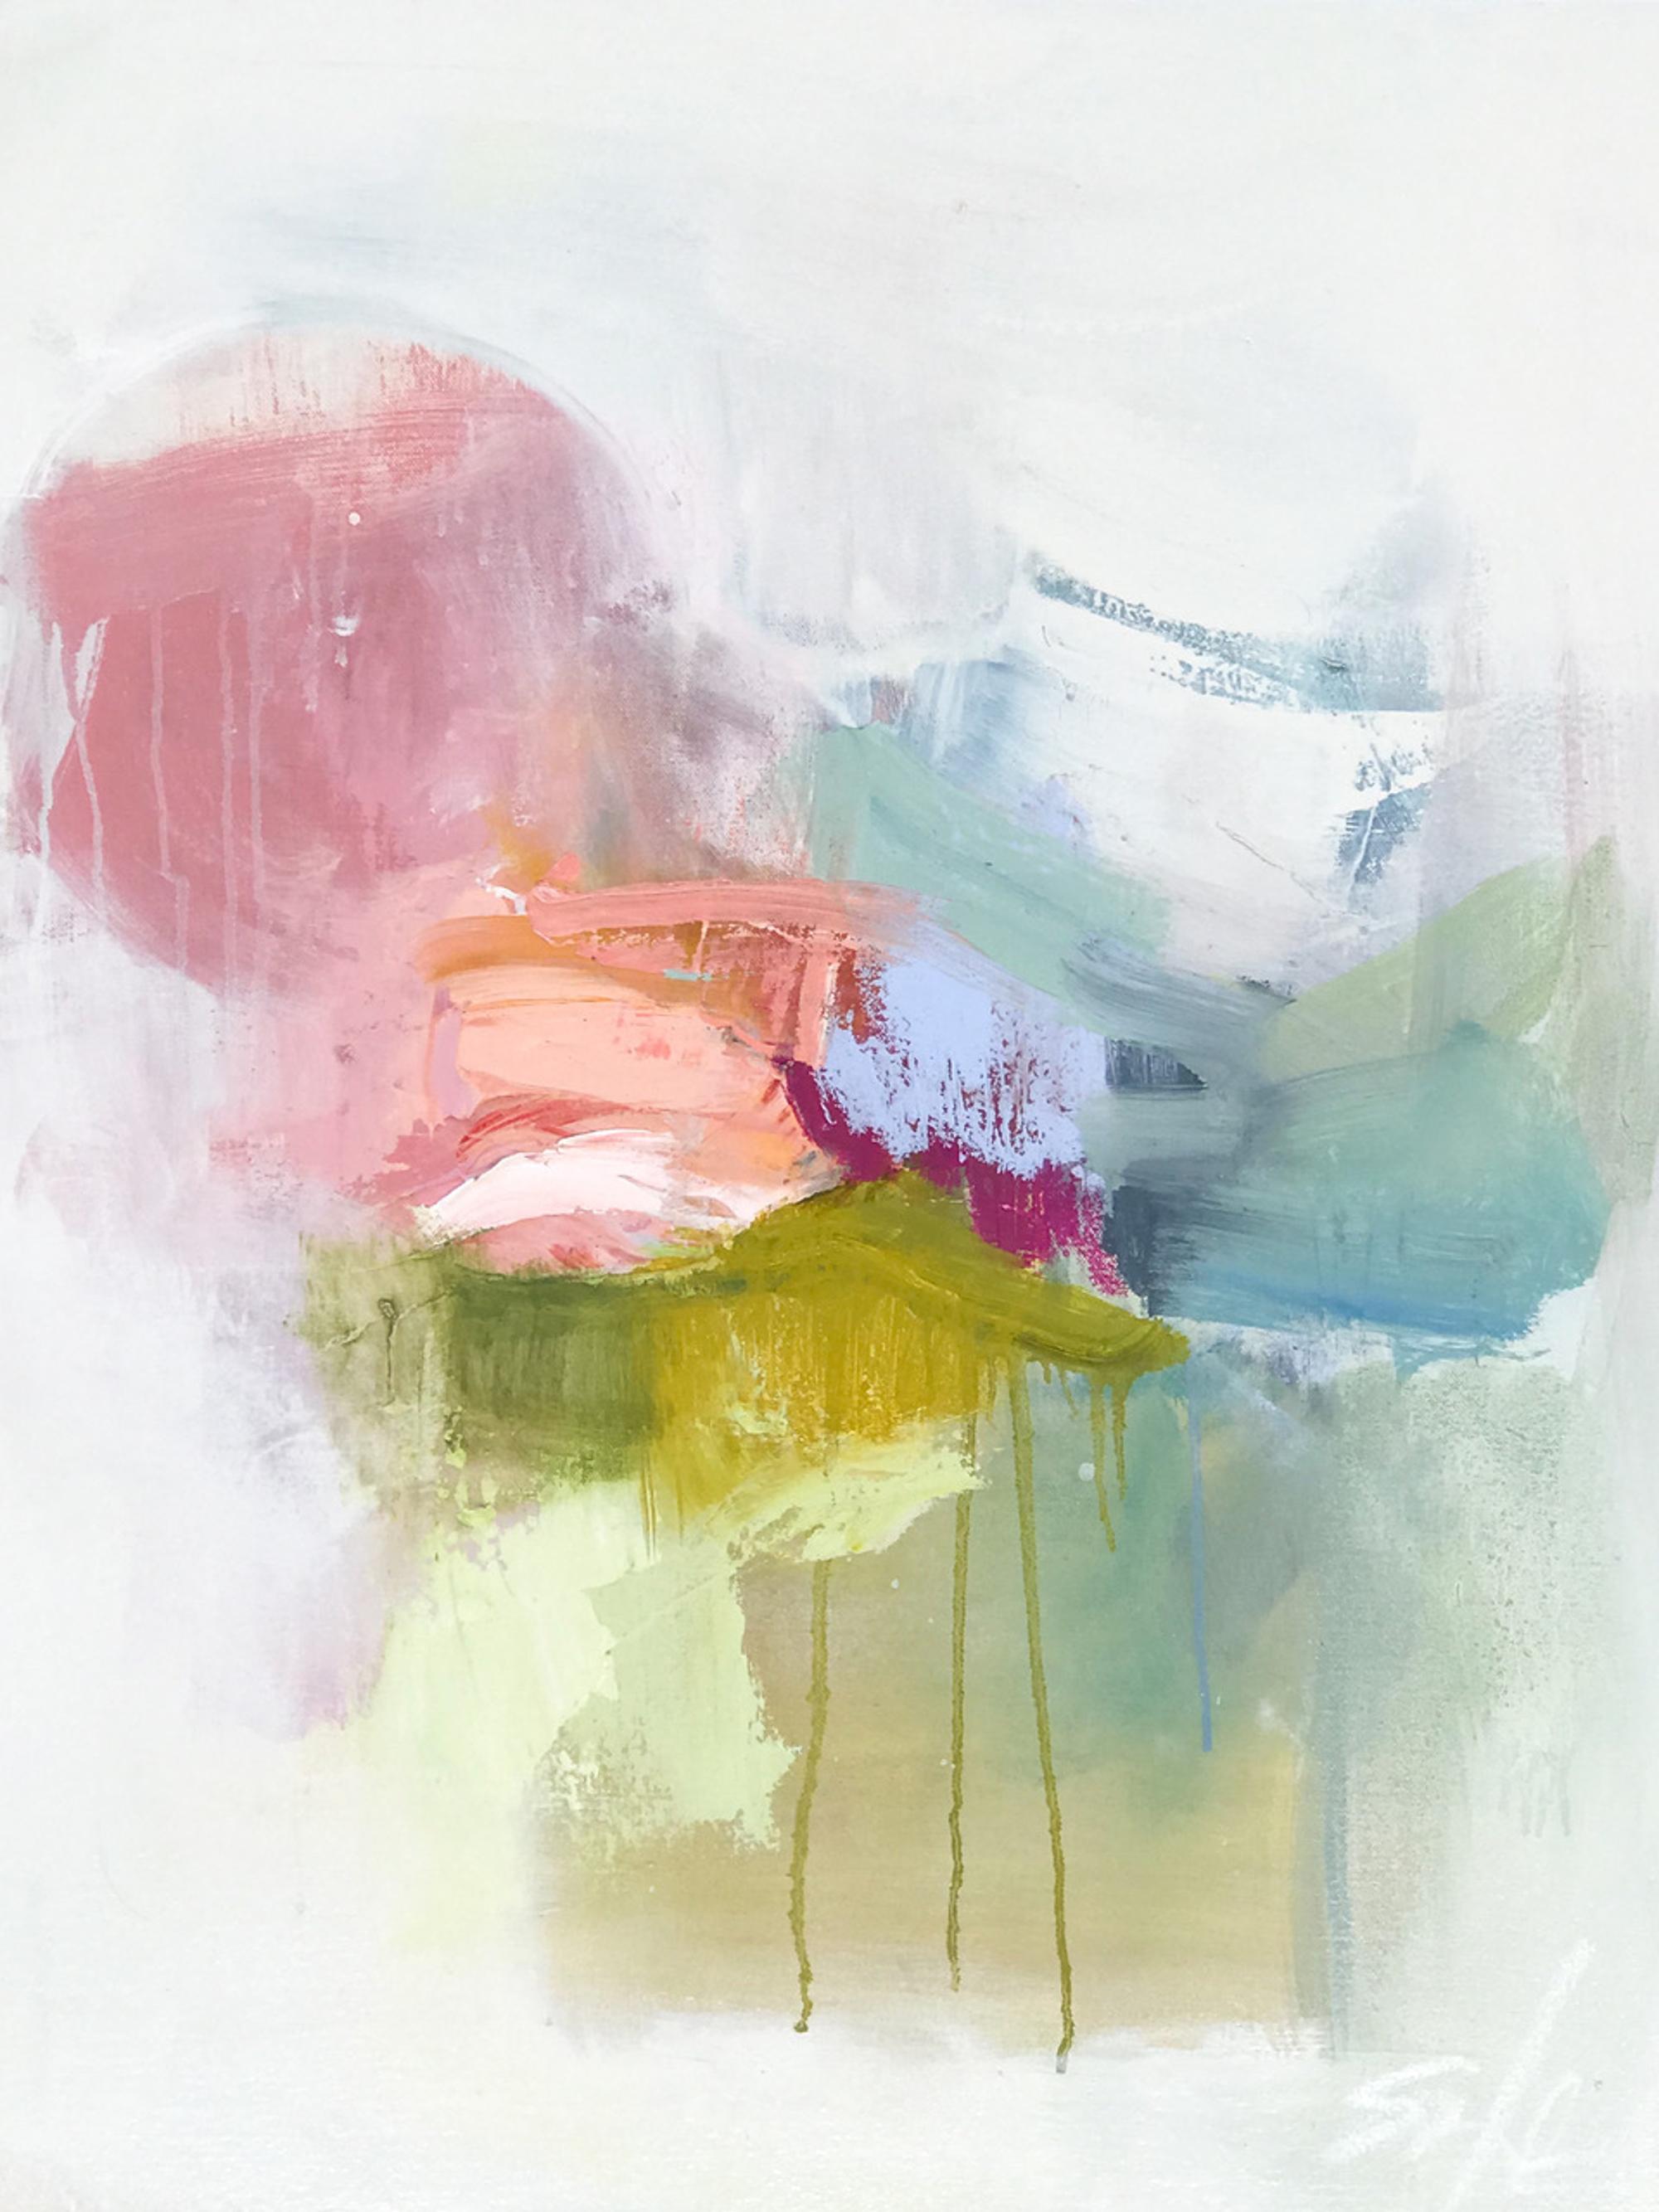 Wandering Hope IV by Sarah Otts